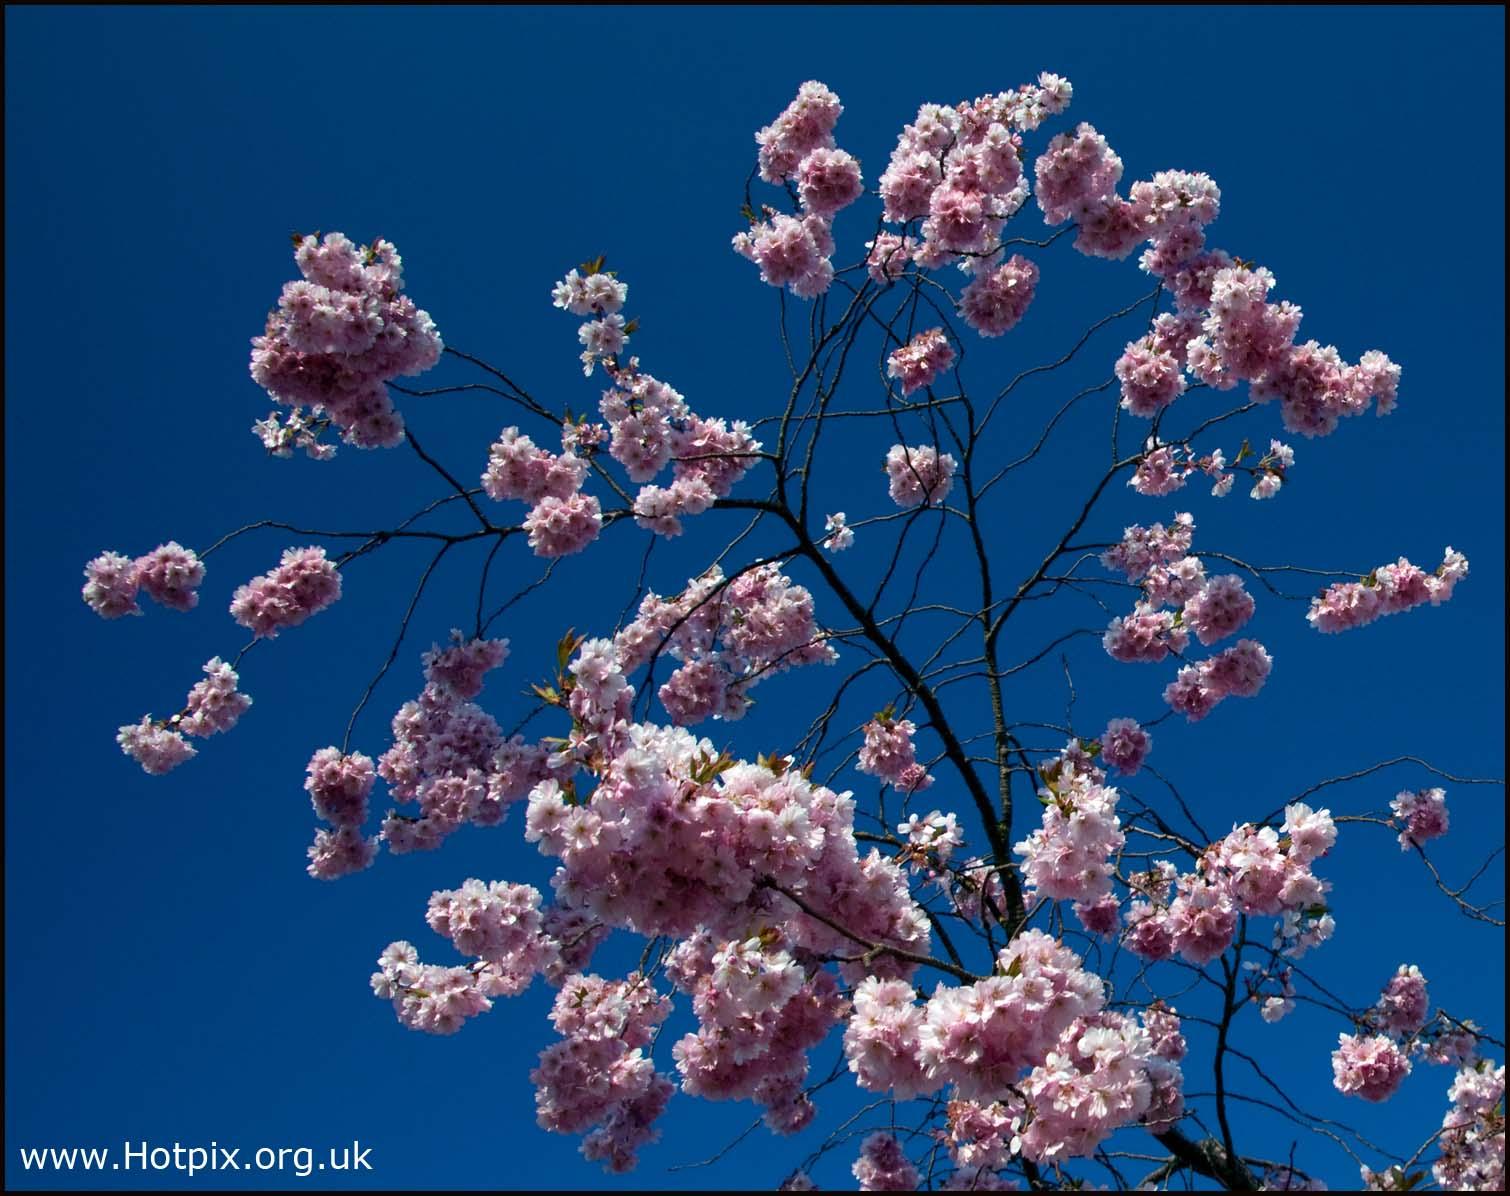 Naturbl\u00fctenblume,flores,purpurrotes,rosarotes,Blumenkirschbaumbuschstrauchfr\u00fchling,Sakura-blauer,Himmel,primavera,nature,blossom,flower,purple,pink,red,flowers,cherry,tree,bush,shrub,spring,sakura,blue,sky,rouge-rose,pourpre,de,ciel,bleu,ressort,d'arbuste,buisson,cerisier,fleurs,fleur,rosado,p\u00farpura,del,cielo,azul,resorte,arbusto,cerezo,tonysmith,HDR,sex,sexy,hotpix!